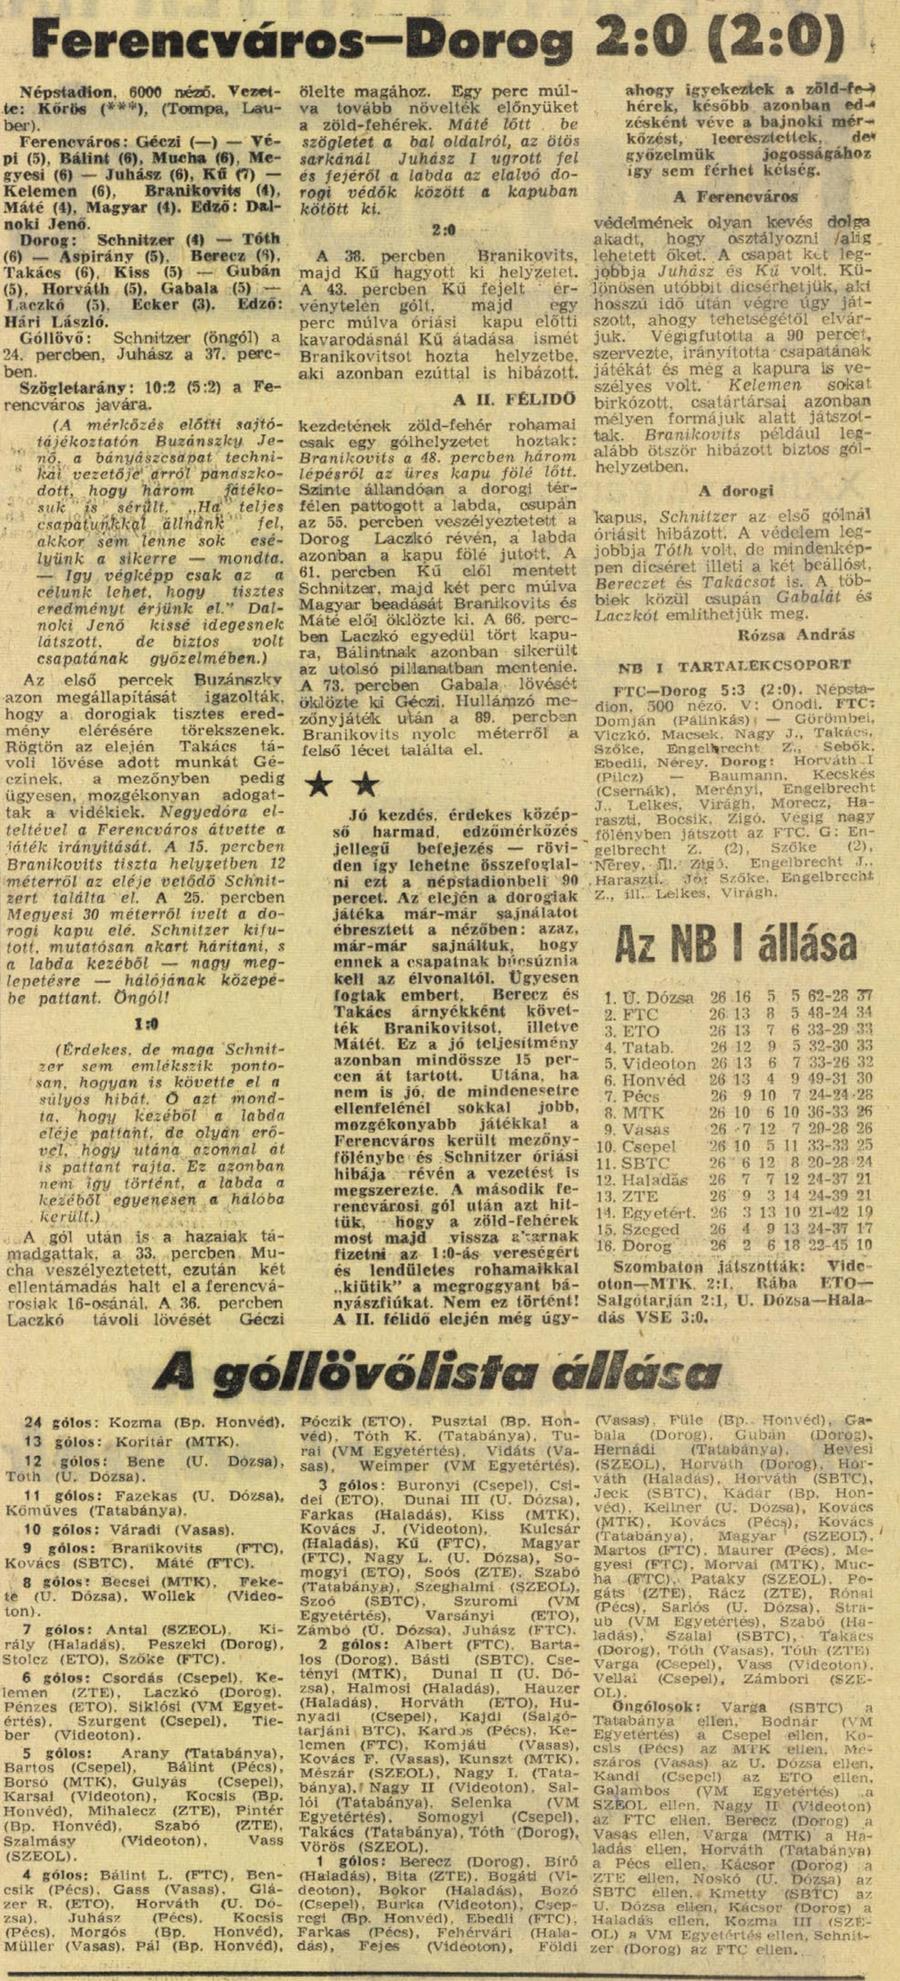 ns-19740506-02-19740505